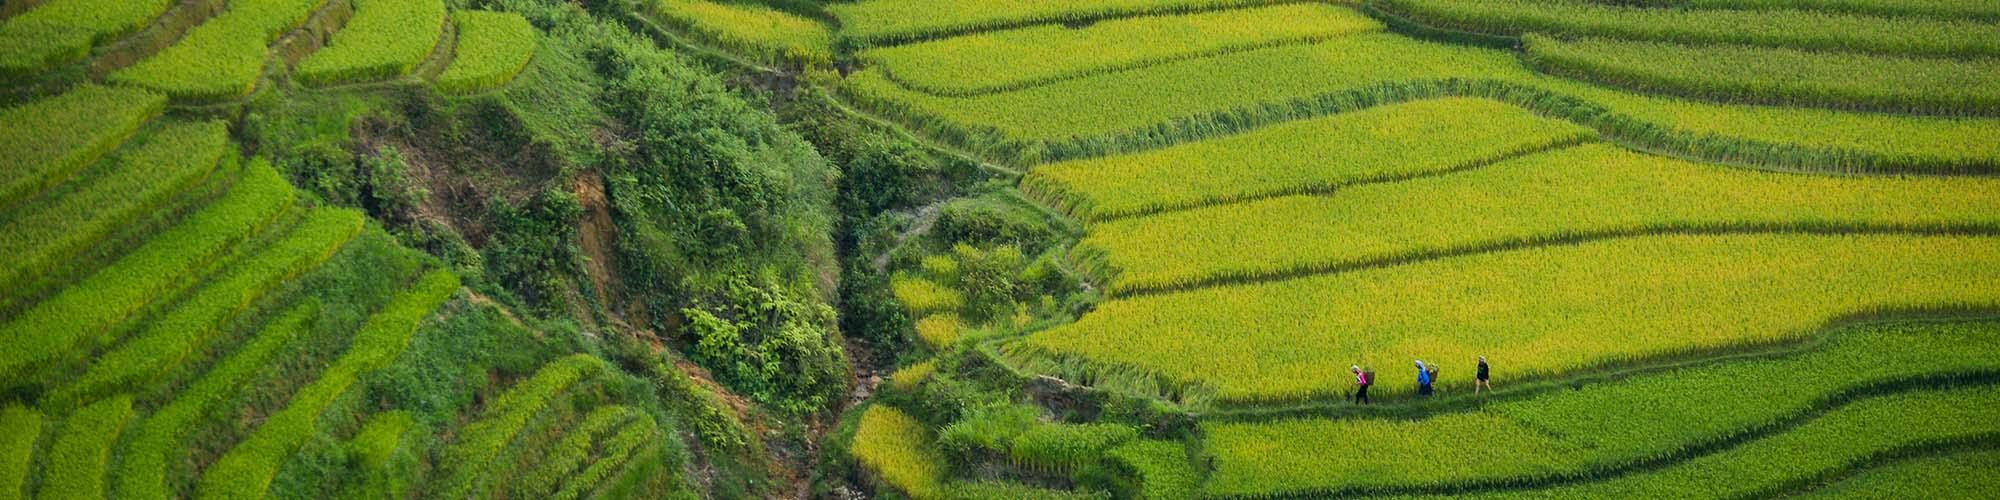 Rice, Plantations, Vietnam, Doan Tuan